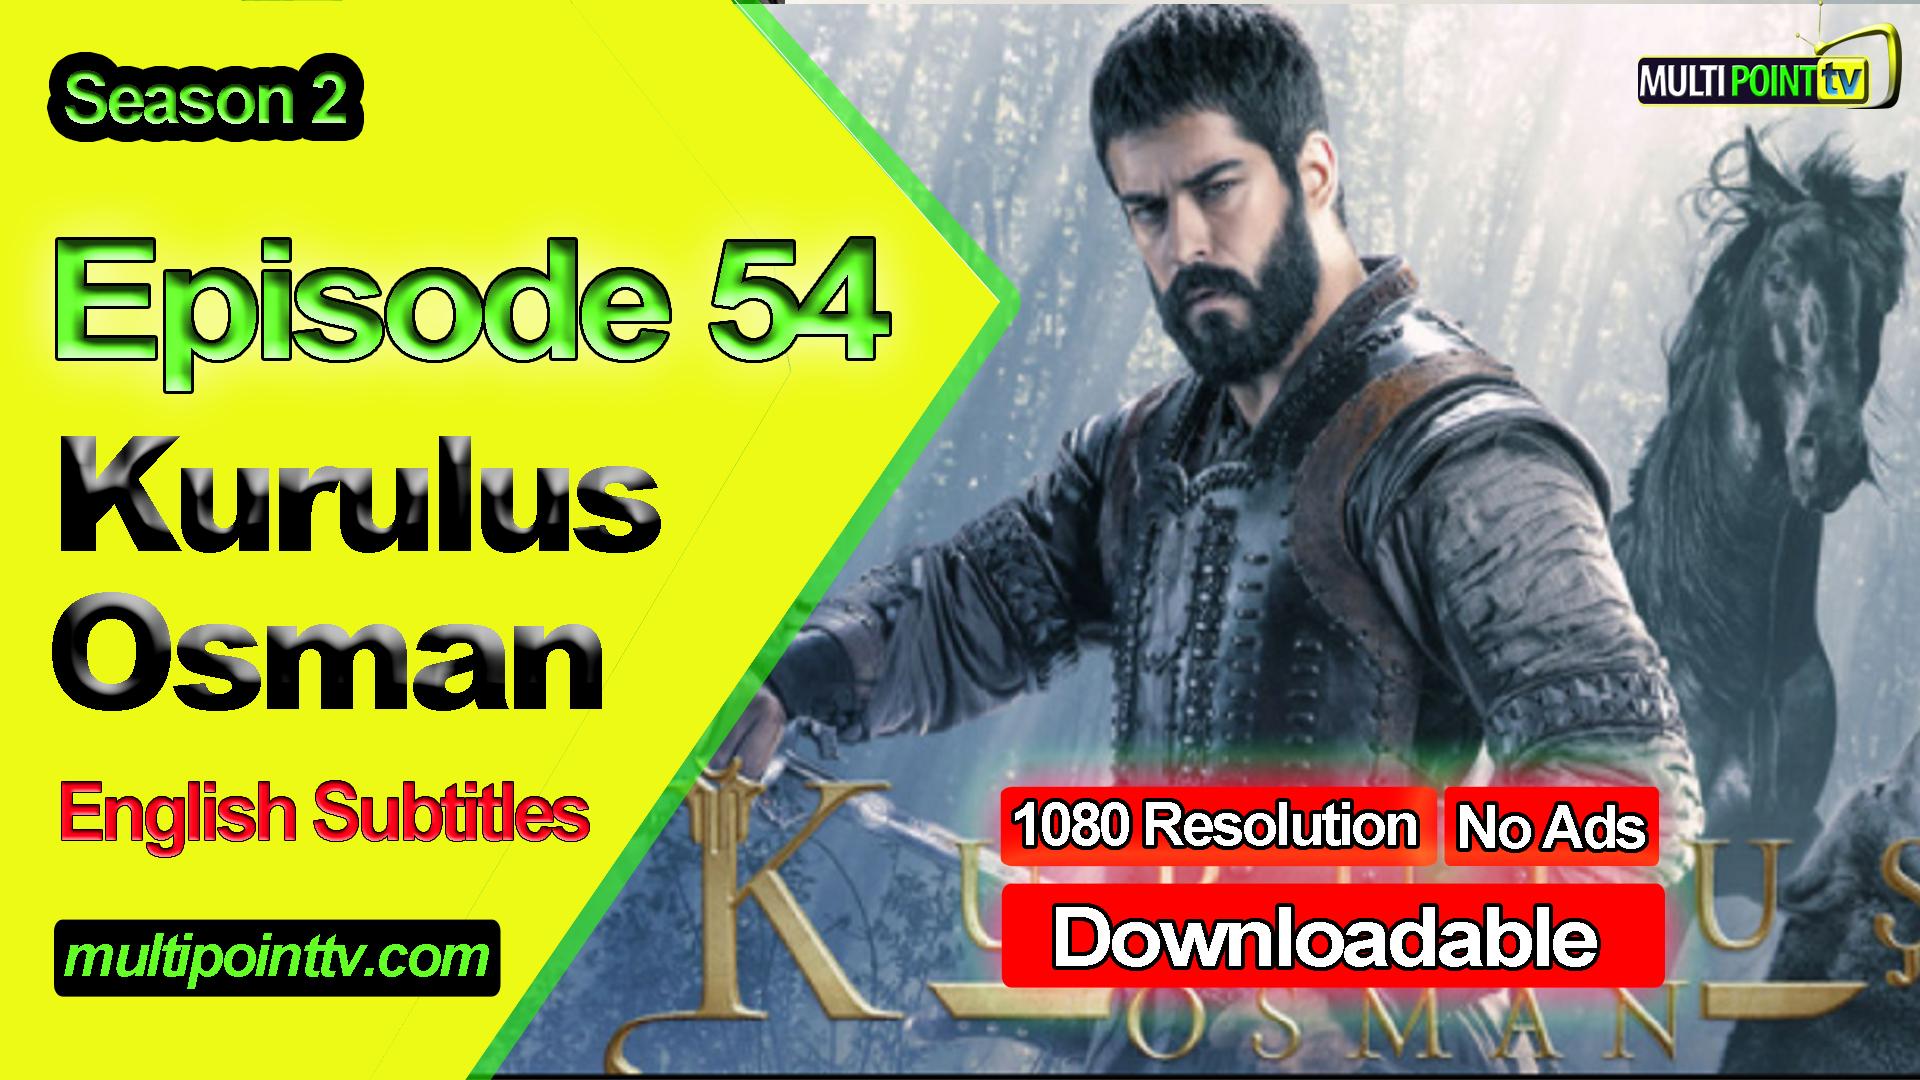 Kurulus Osman Episode 54 English Subtitles